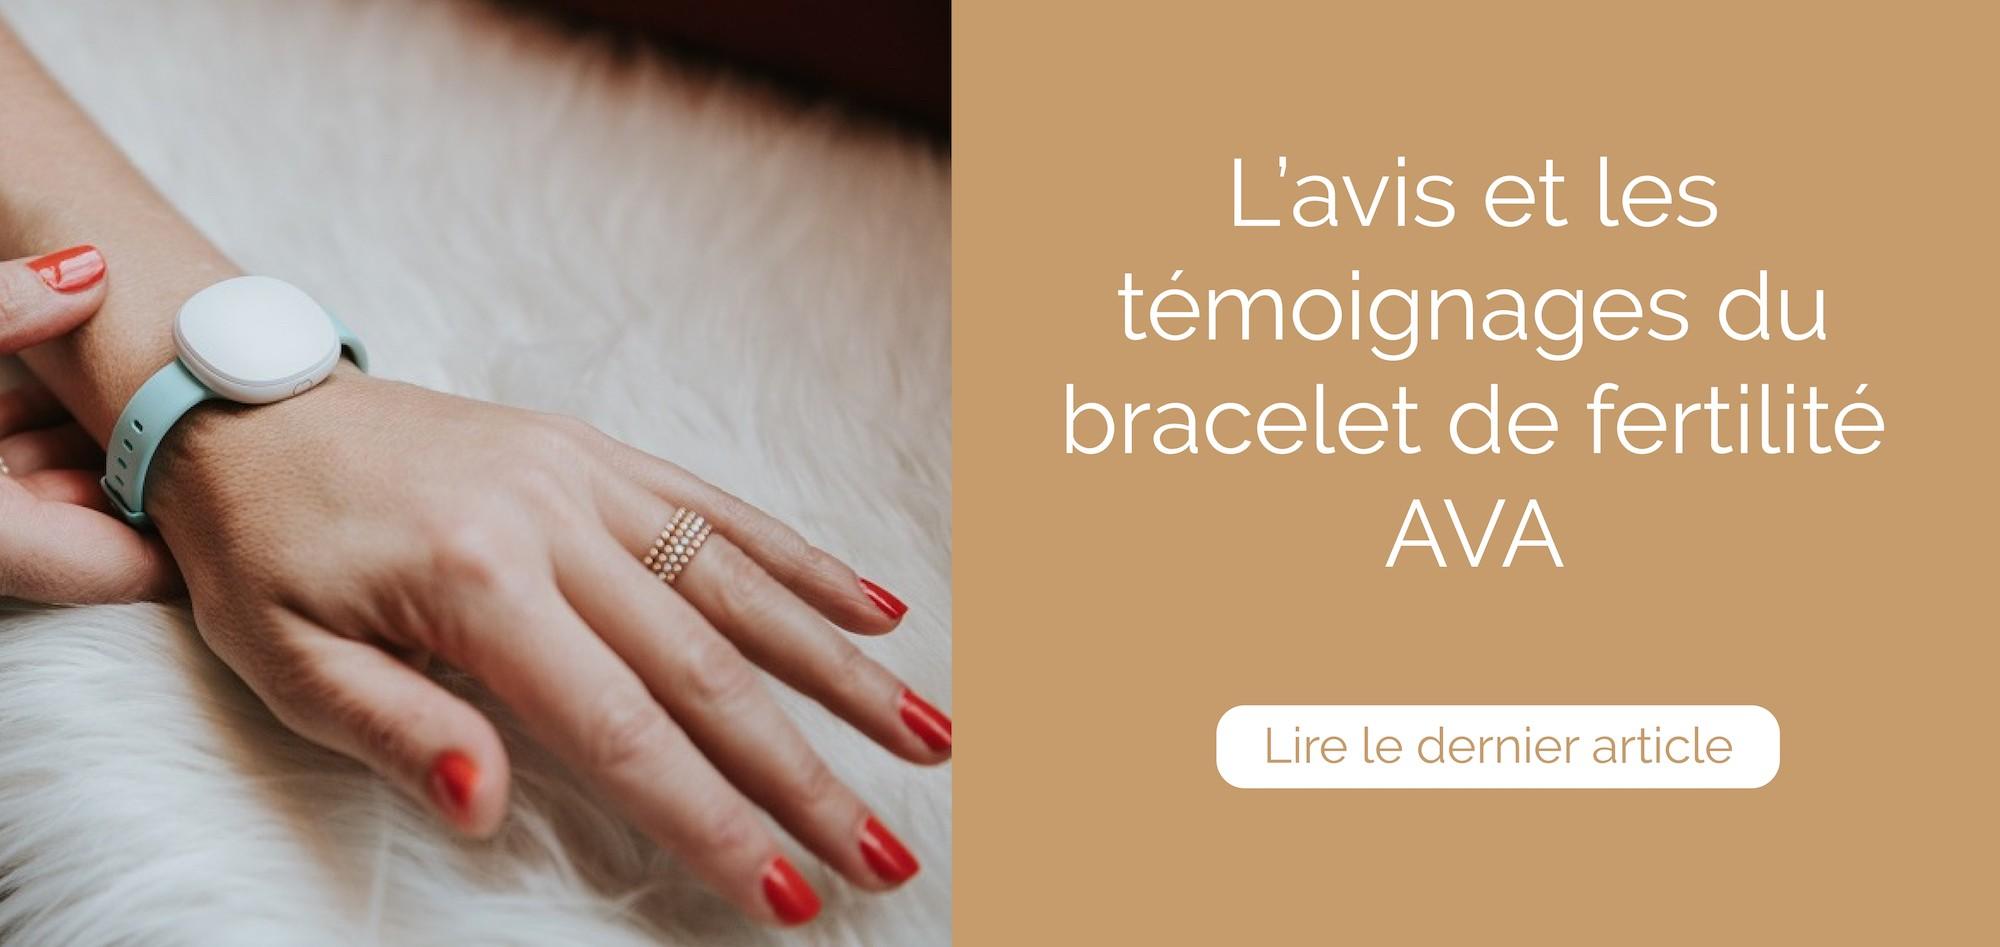 conseils-fertilite-couple-bracelet-tracker-ava